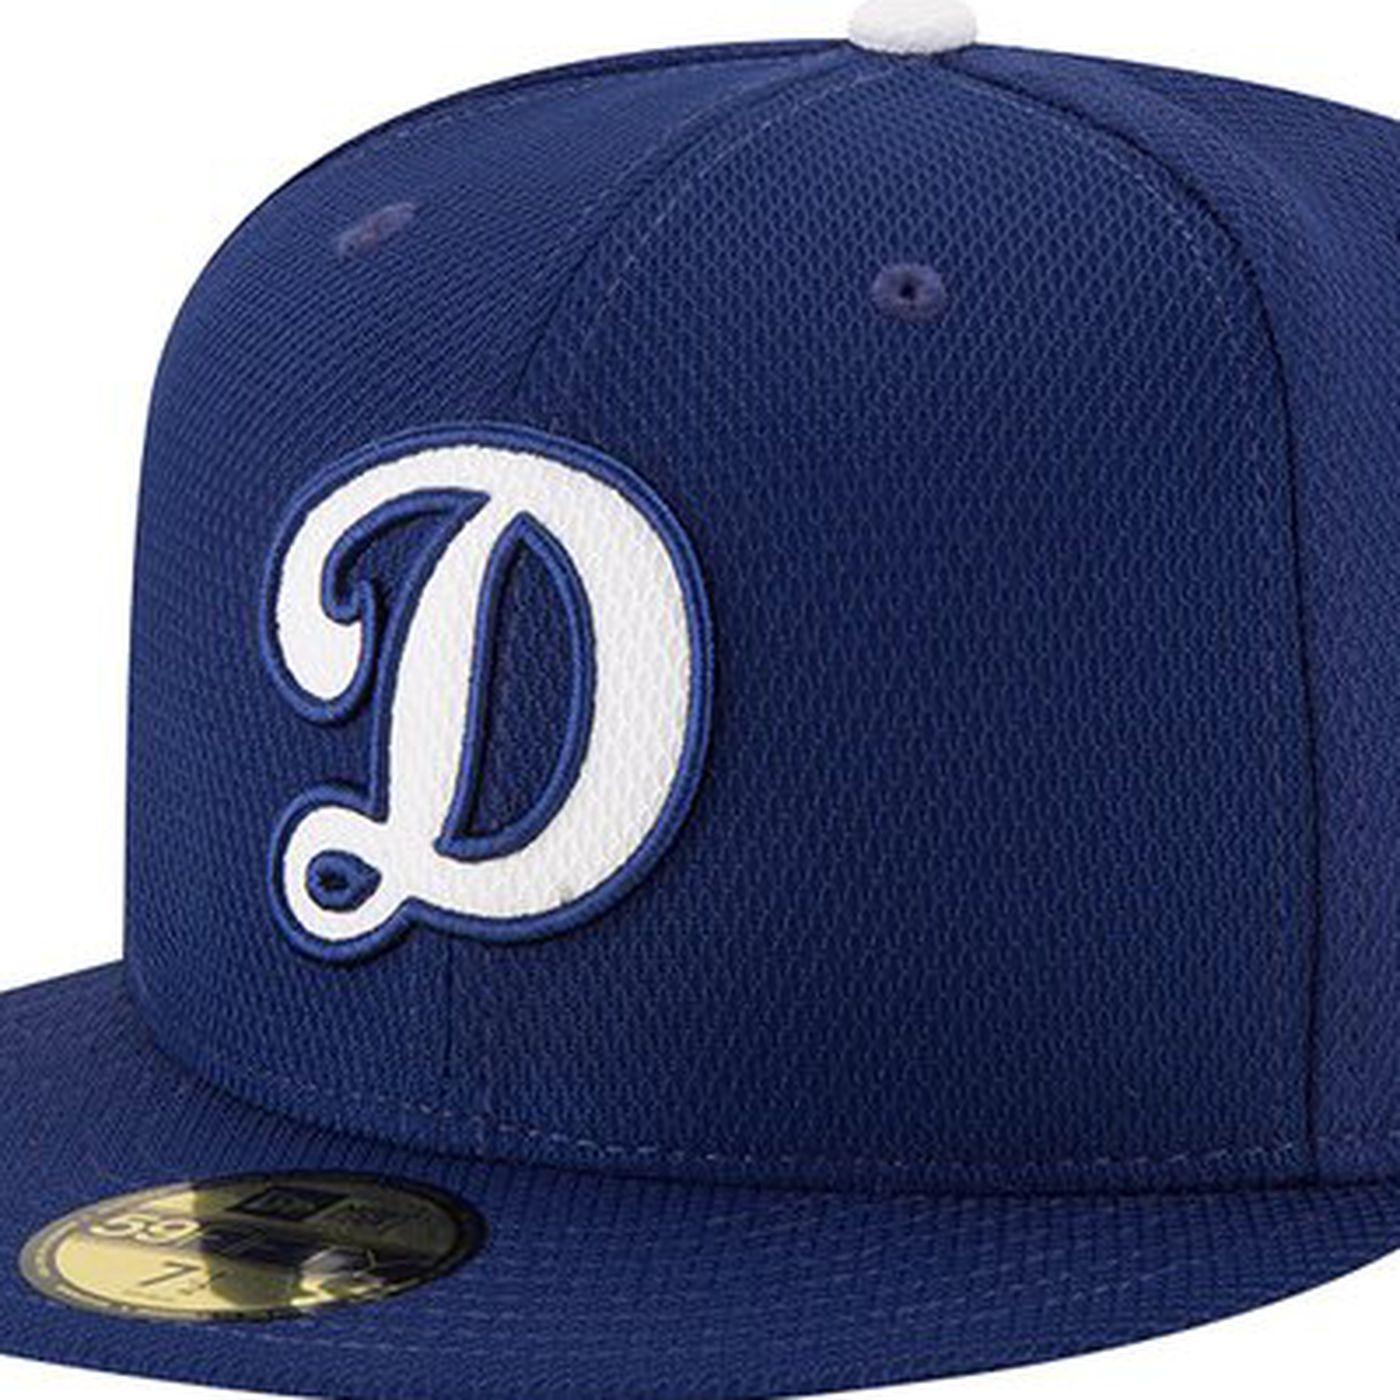 Dodgers 2016 spring training gear includes alternate  D  cap - True ... 2ab3ce106c7